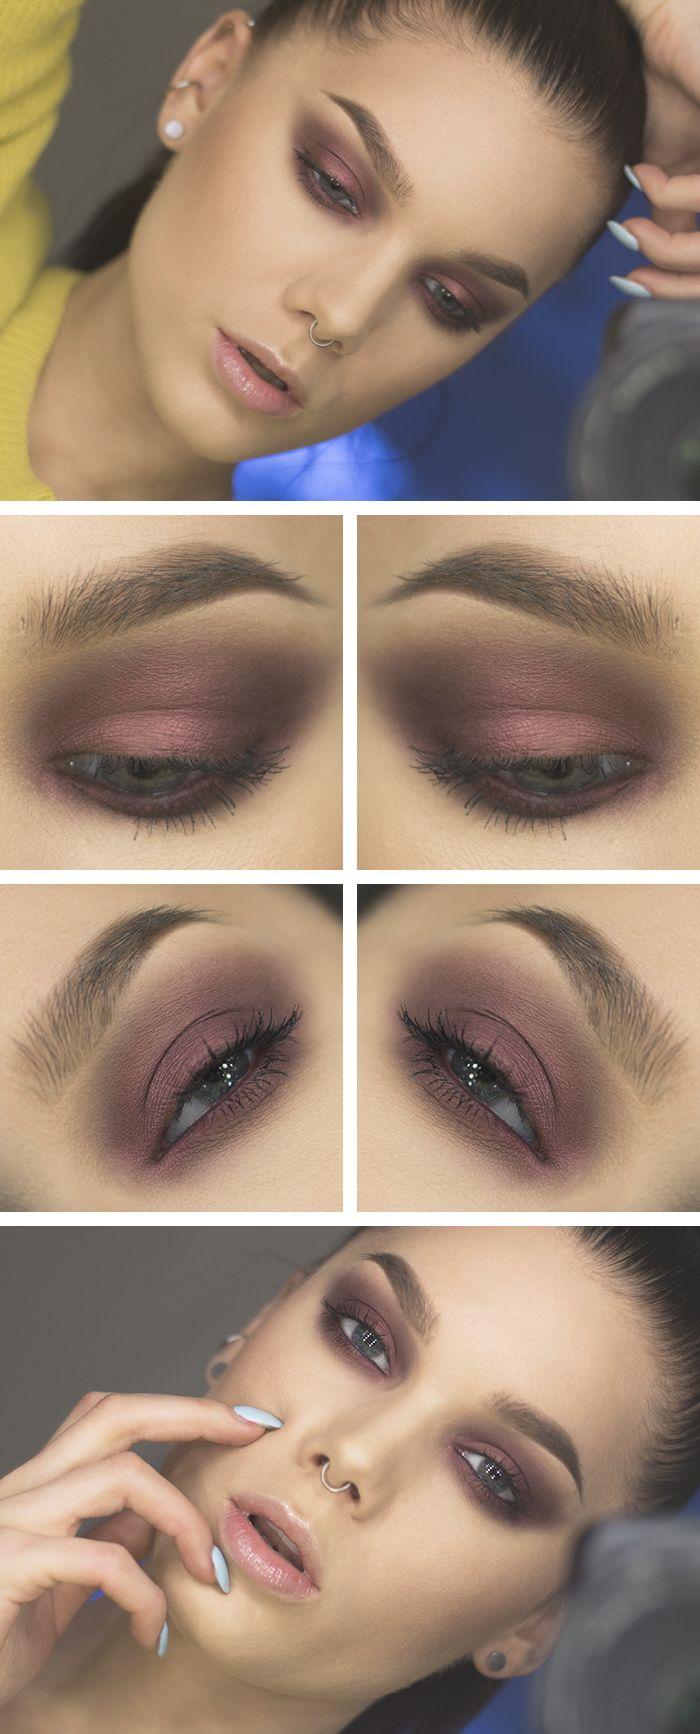 BLAAH - EYES: MAC Eyeshadow Vainglorious (from Disney collection), MAC Fix+, MUS MS Desert, NYX Doll eye mascara long lash. LIPS: Dior Addict Ultra-gloss 152 Pearl. CHEEKS: Anastasia contour kit, MUS Wonder powder Sinai, MUS Blush Zarci.